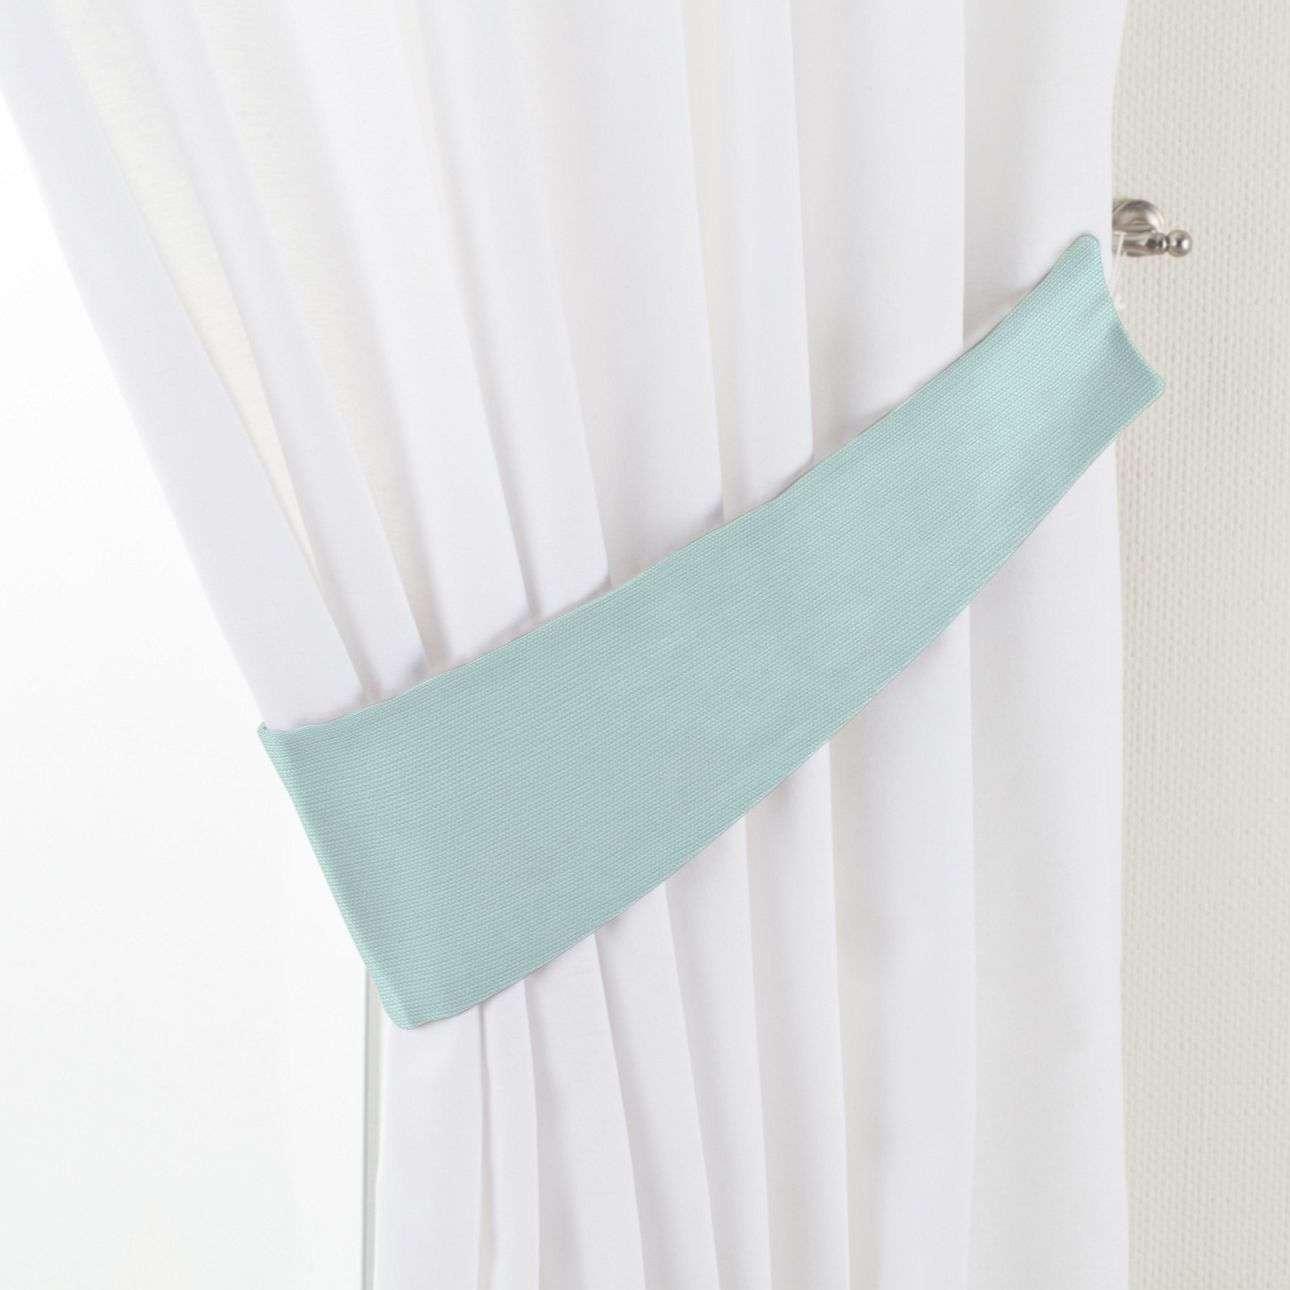 Gardinomtag Victoria 12 x 70 cm i kollektionen Panama Cotton , Tyg: 702-10